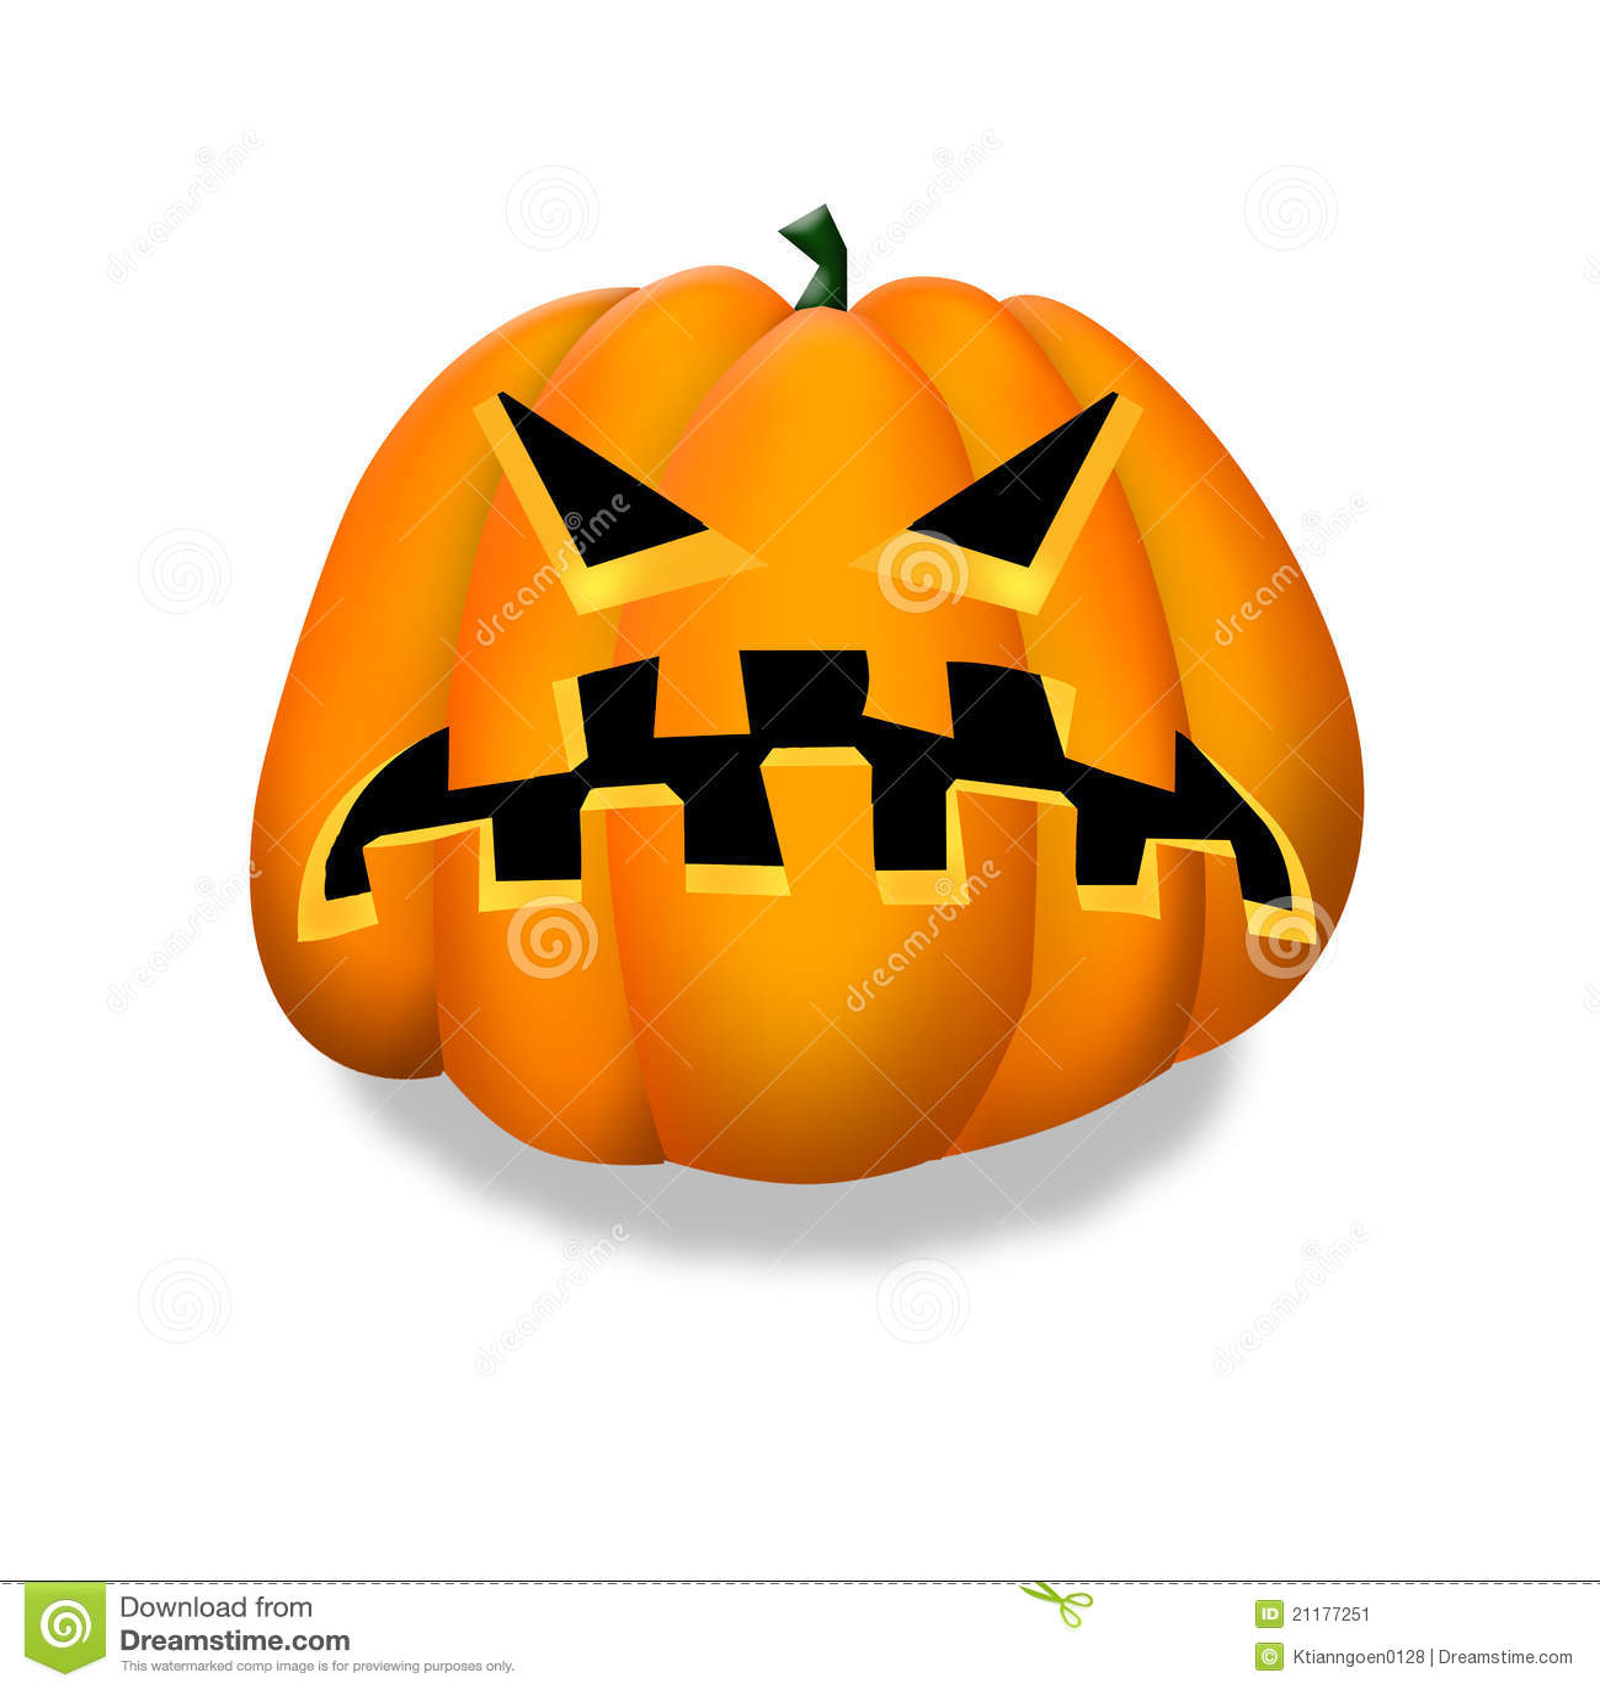 Halloween pumpkin clipart stock image image 21177251 for Halloween pumpkin clipart